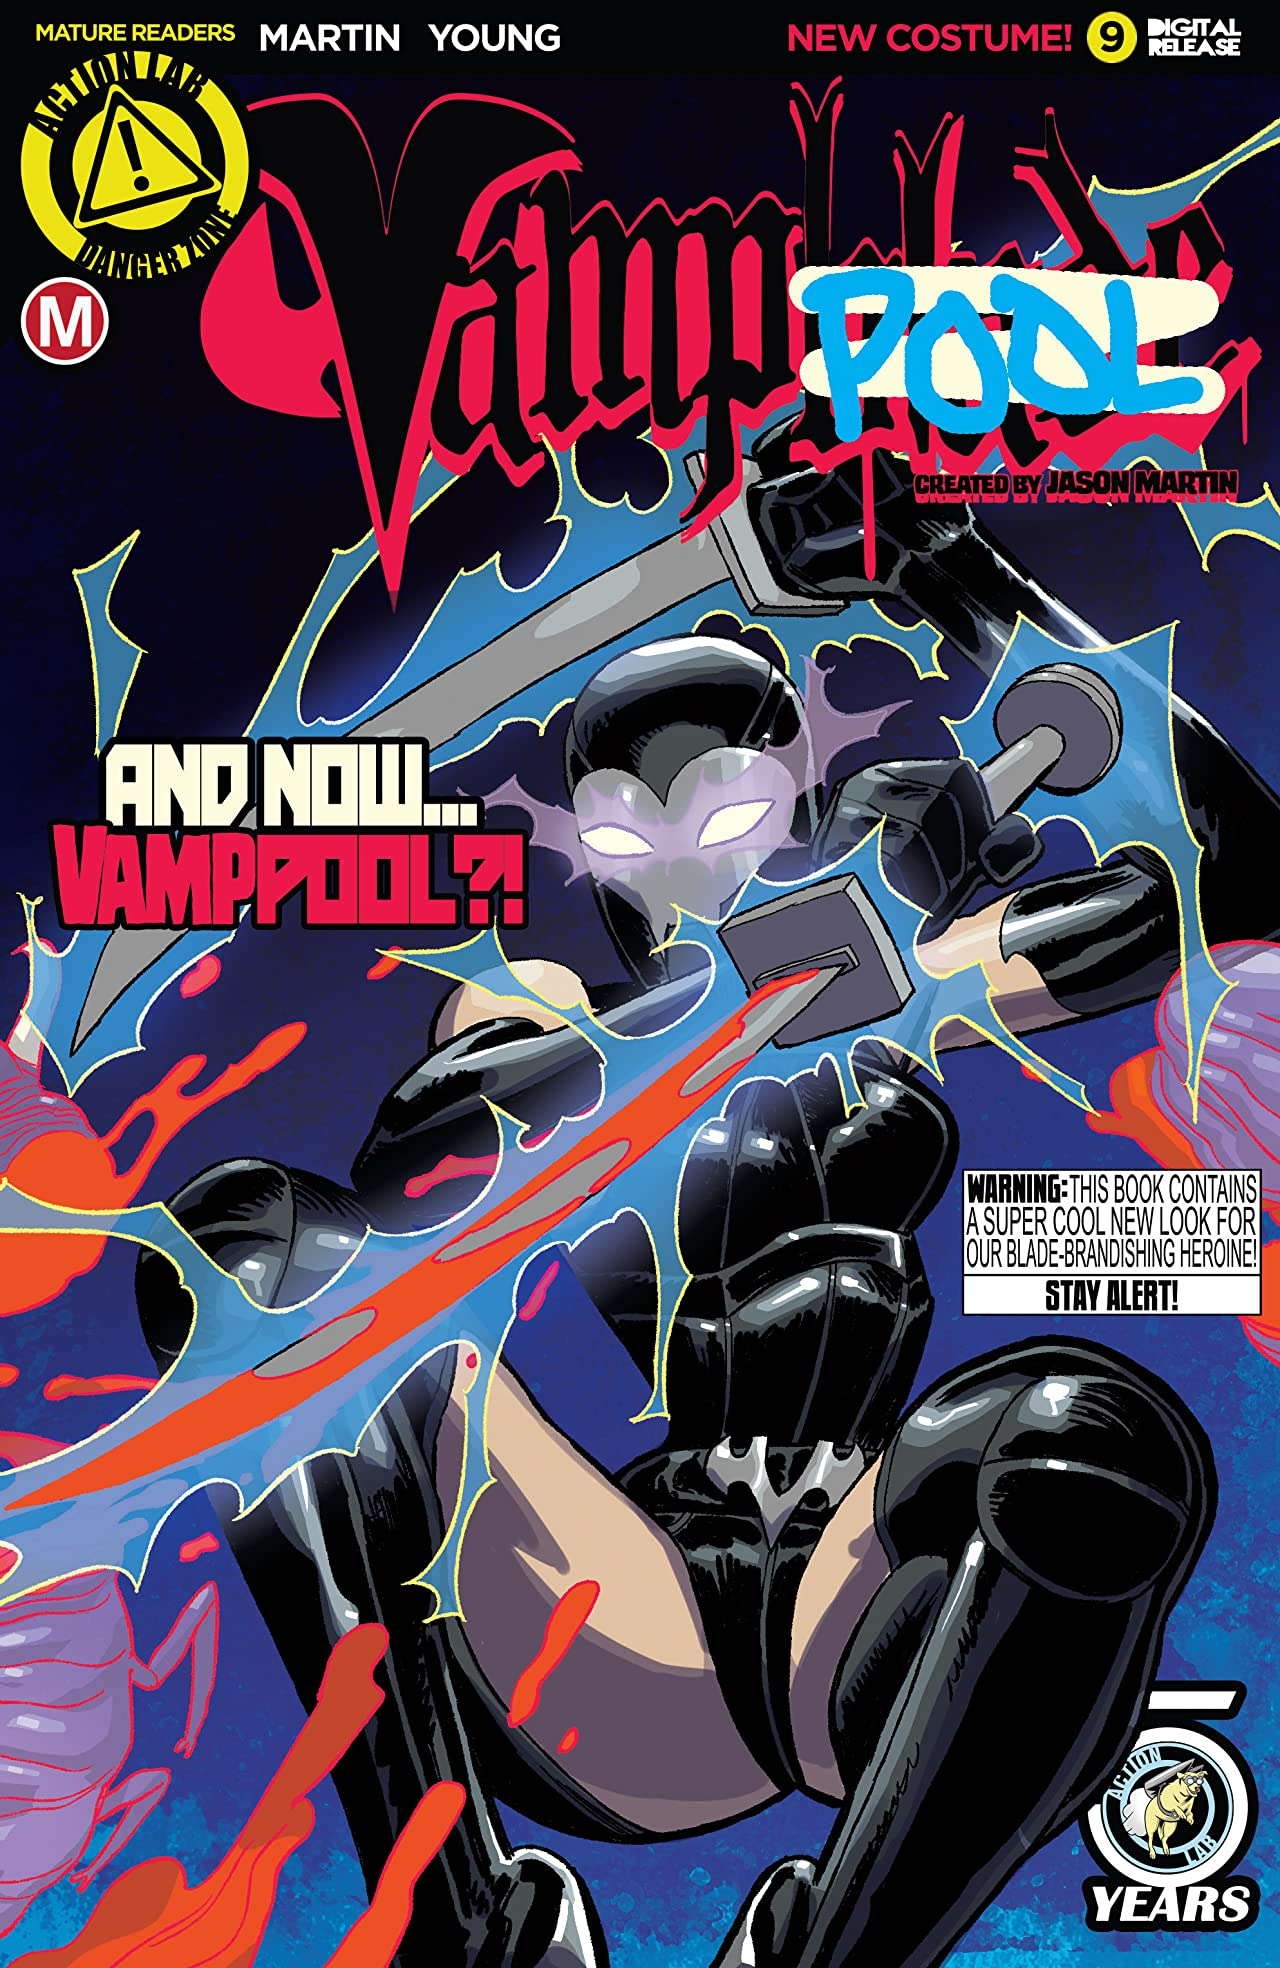 Vampblade #9